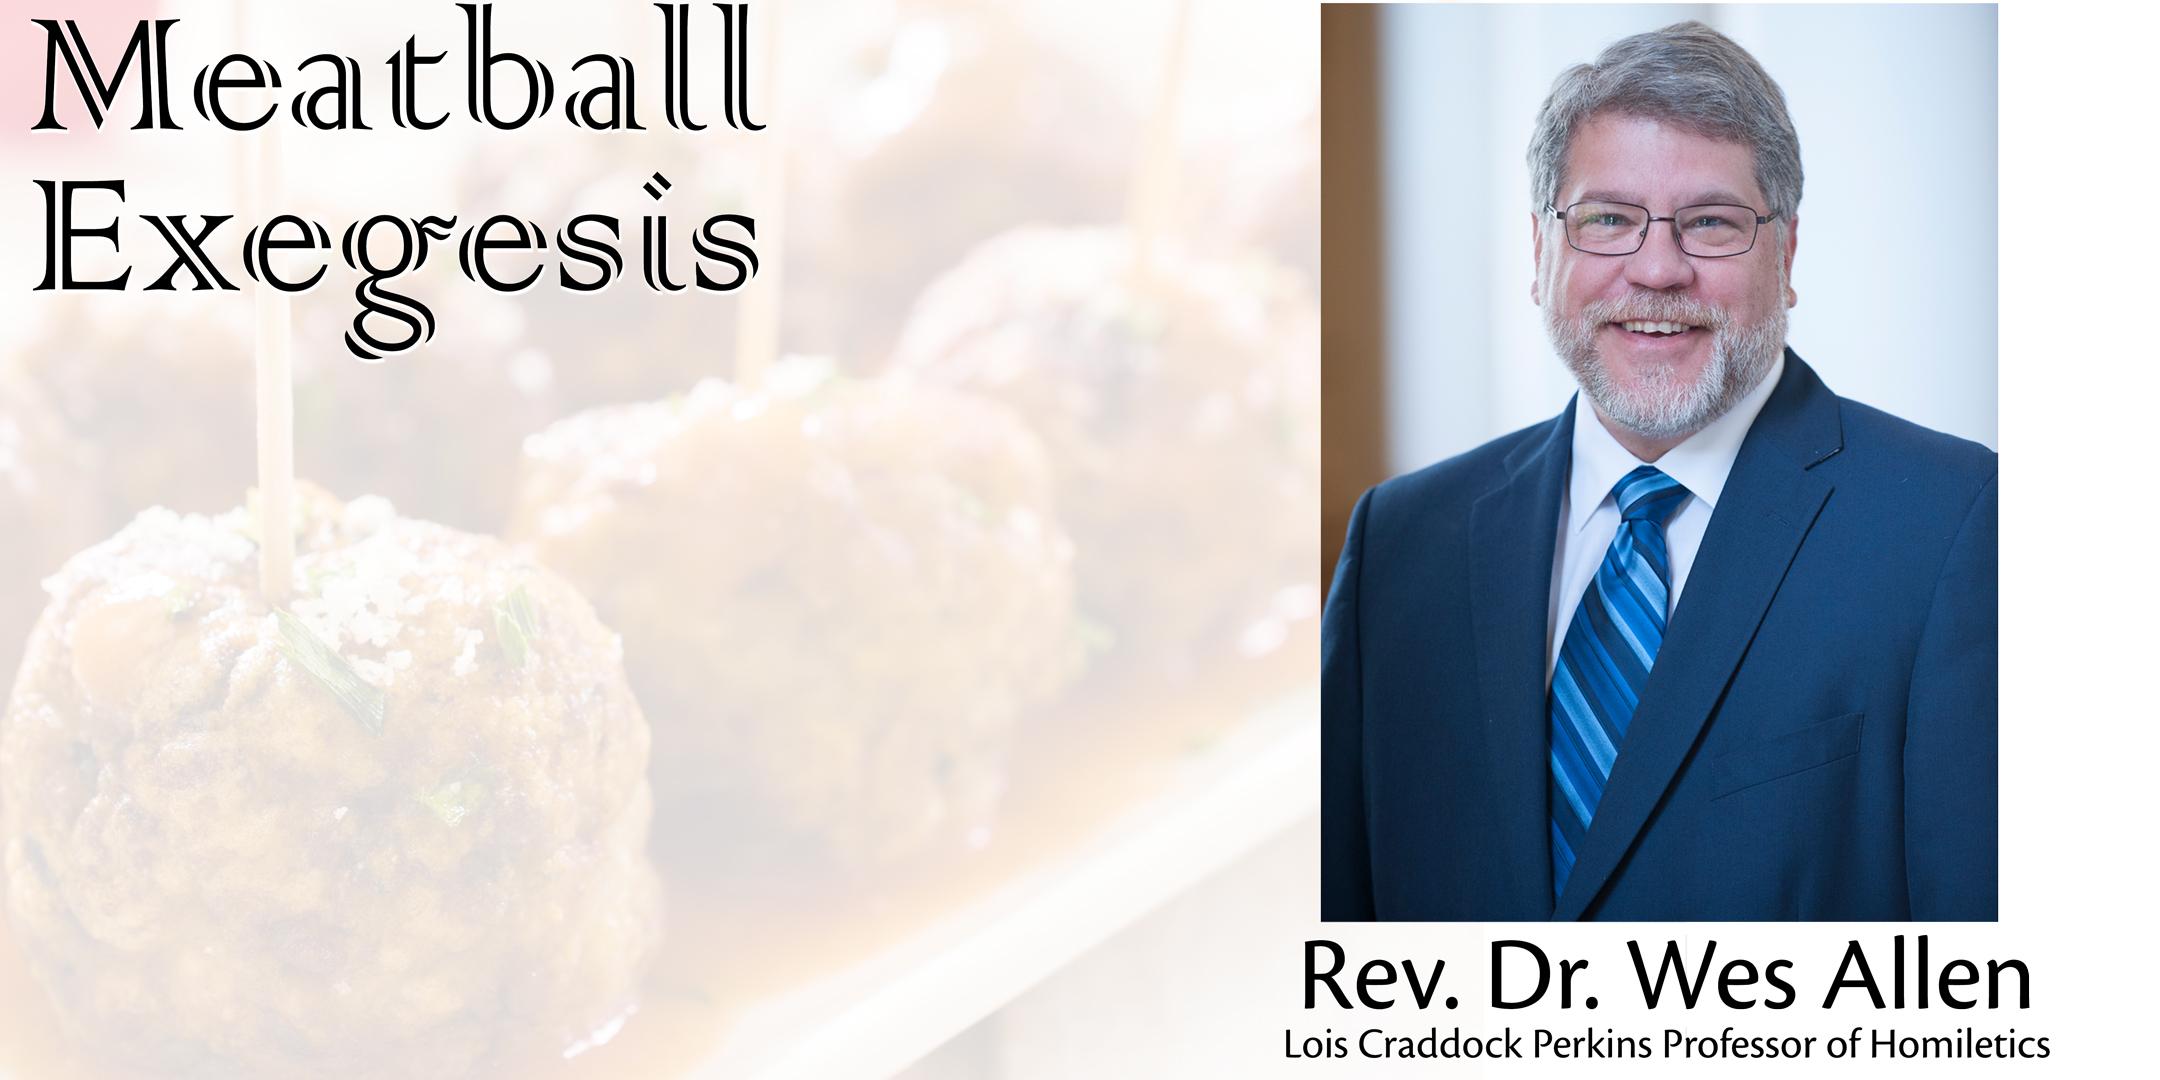 Rev-Dr-Wes-Allen-Meatball-Exegesis.jpg